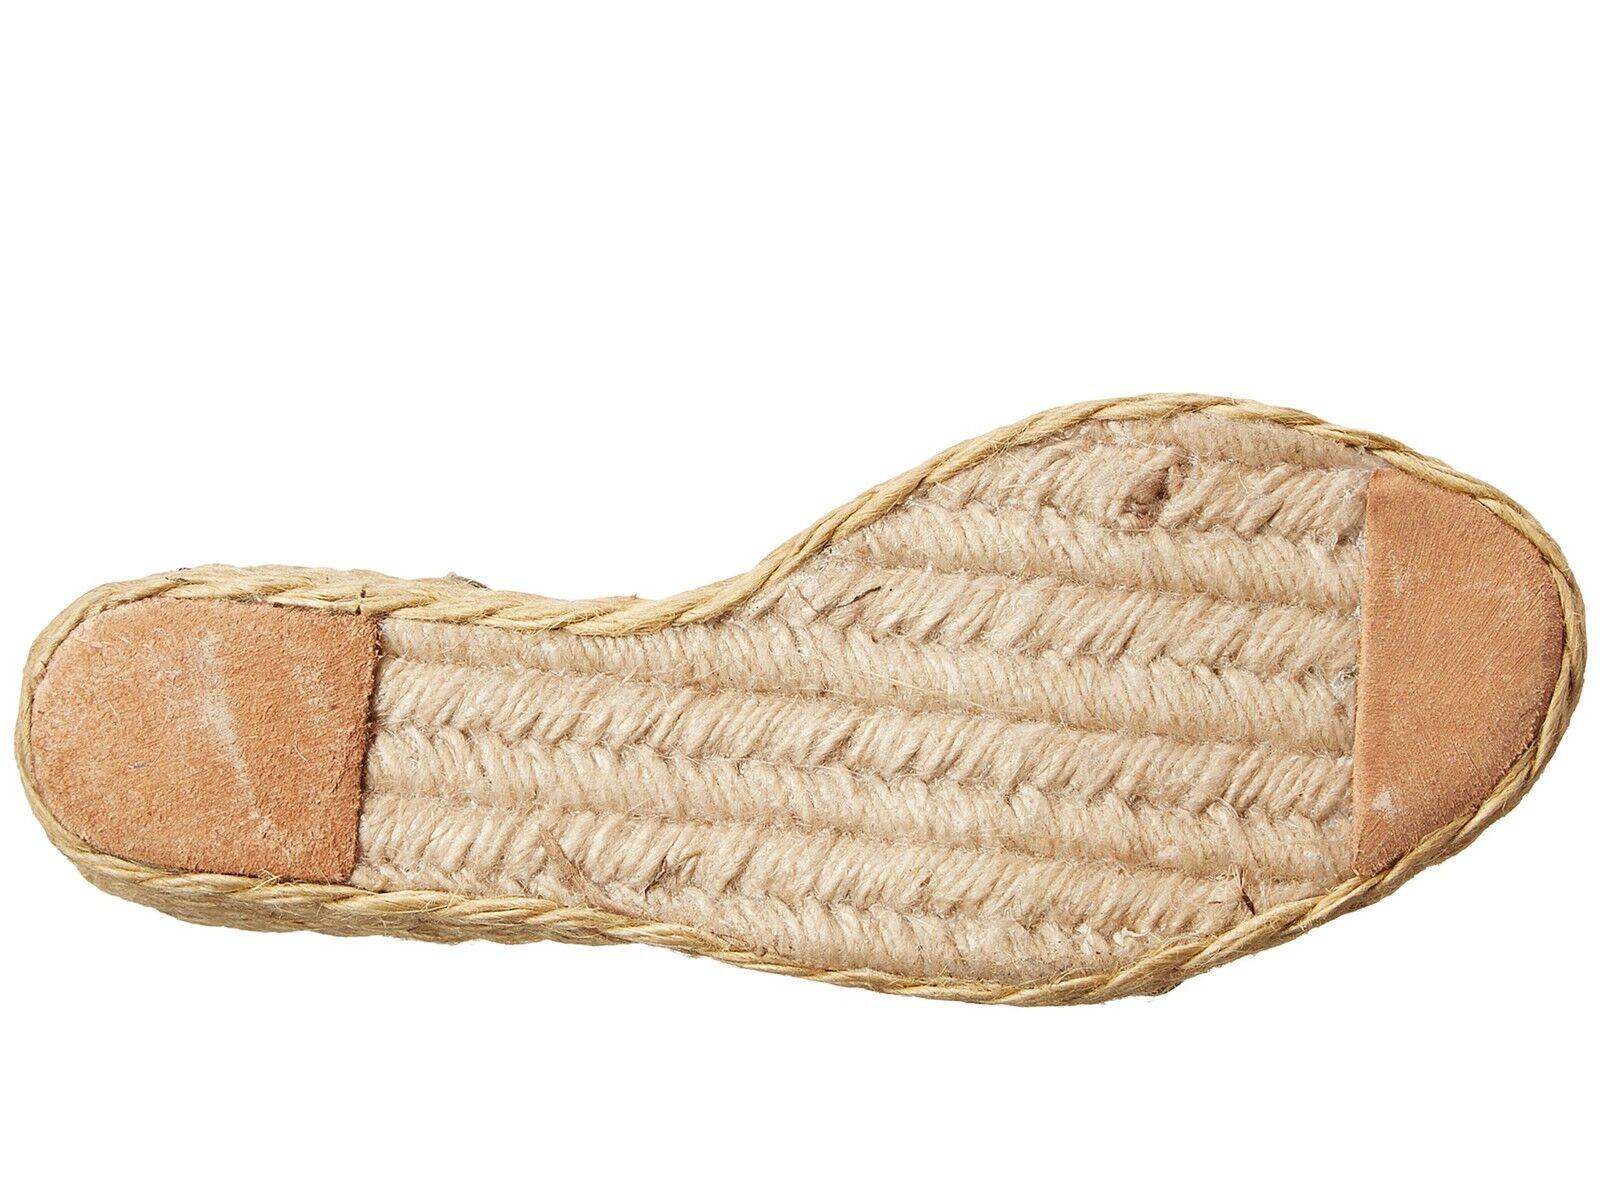 RALPH LAUREN CORALA PLATINO damen WEDGES SANDALS SANDALS SANDALS schuhe MULTIGrößeS AS c13092